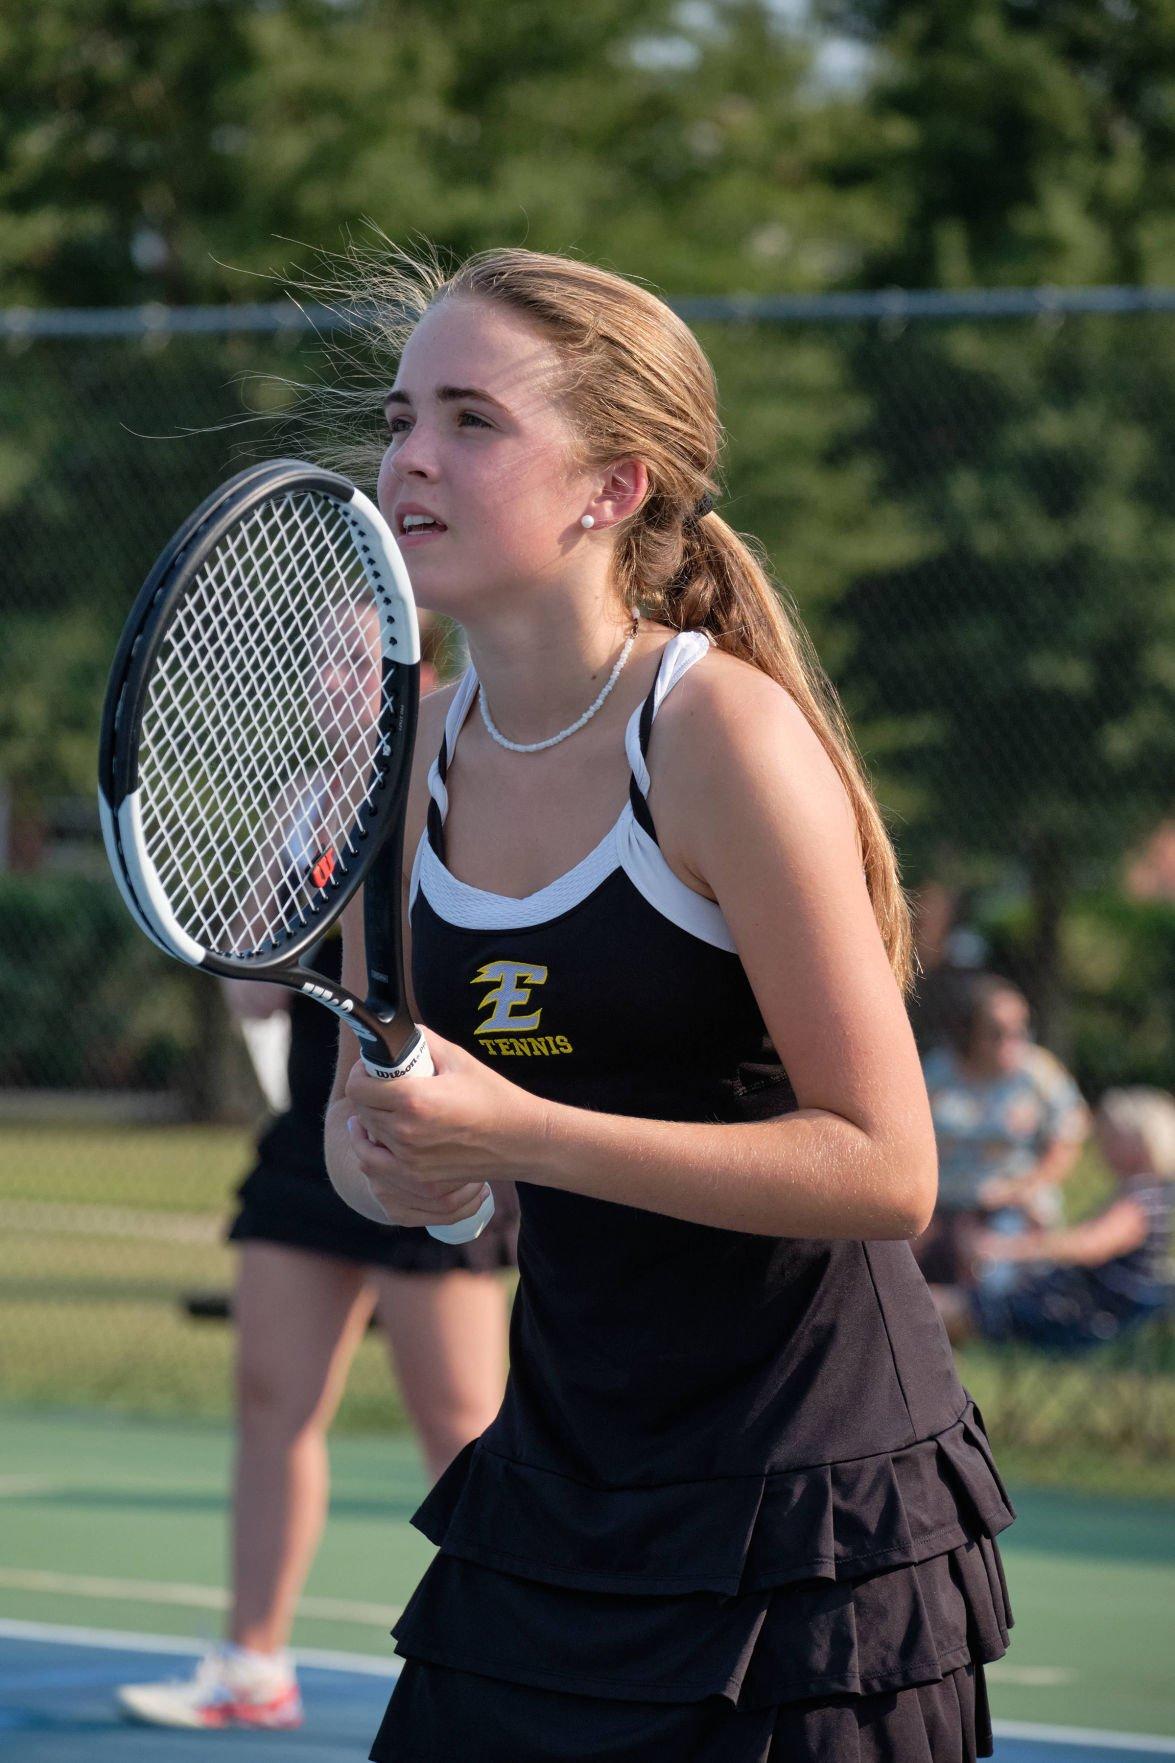 JAHLA Tennis1.jpg